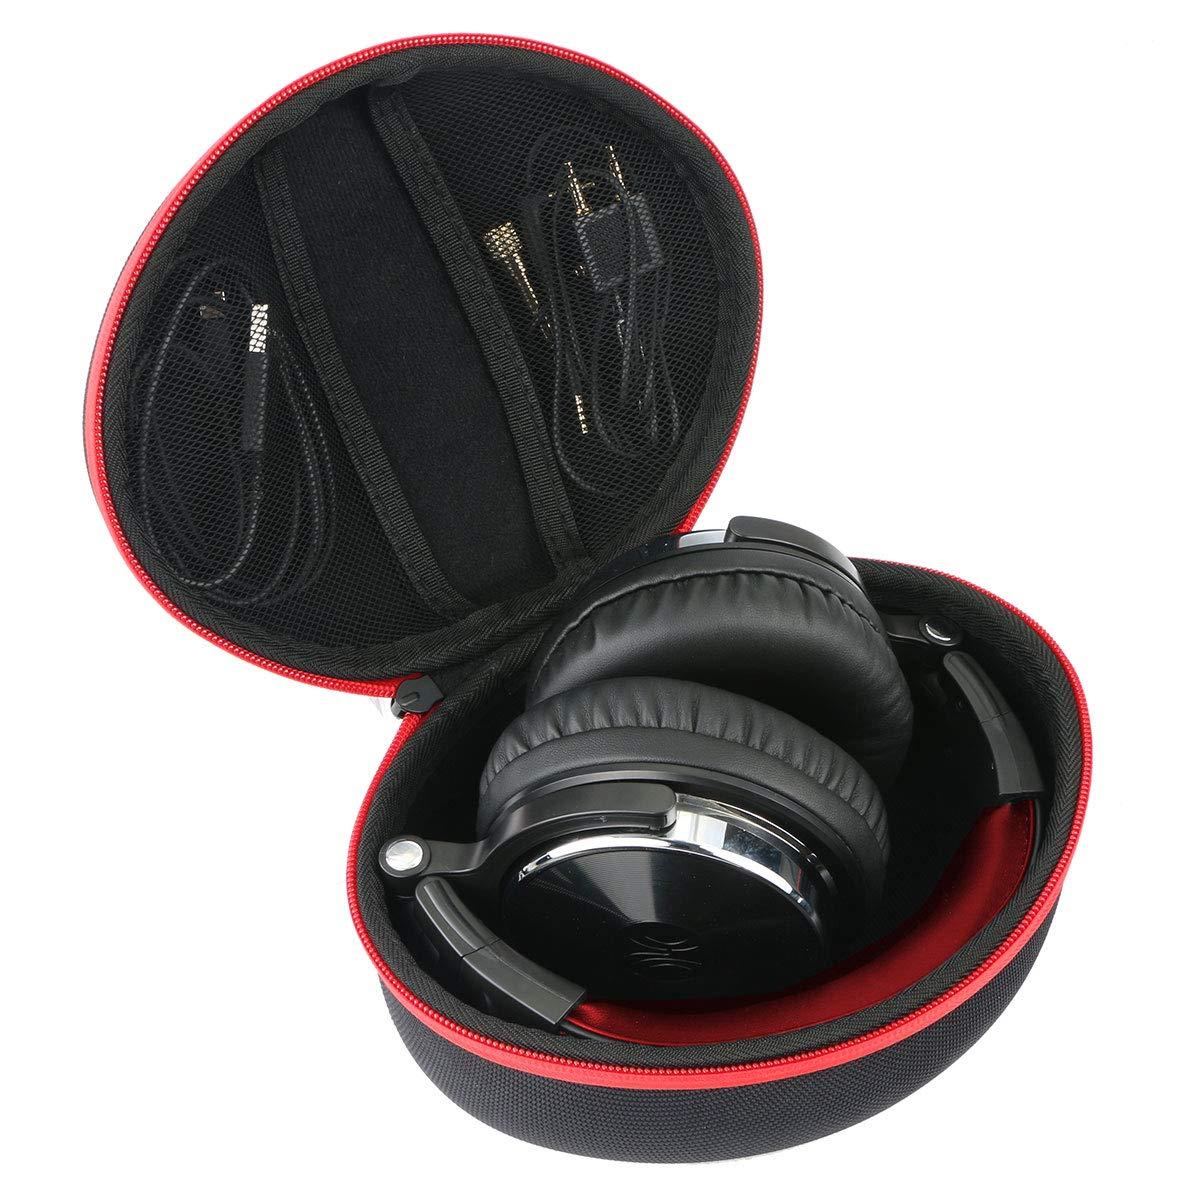 Khanka Headphone Case for OneOdio Over Ear Headphones Closed Back Studio DJ Headphones bluetooth headset. (case only,Red zipper)